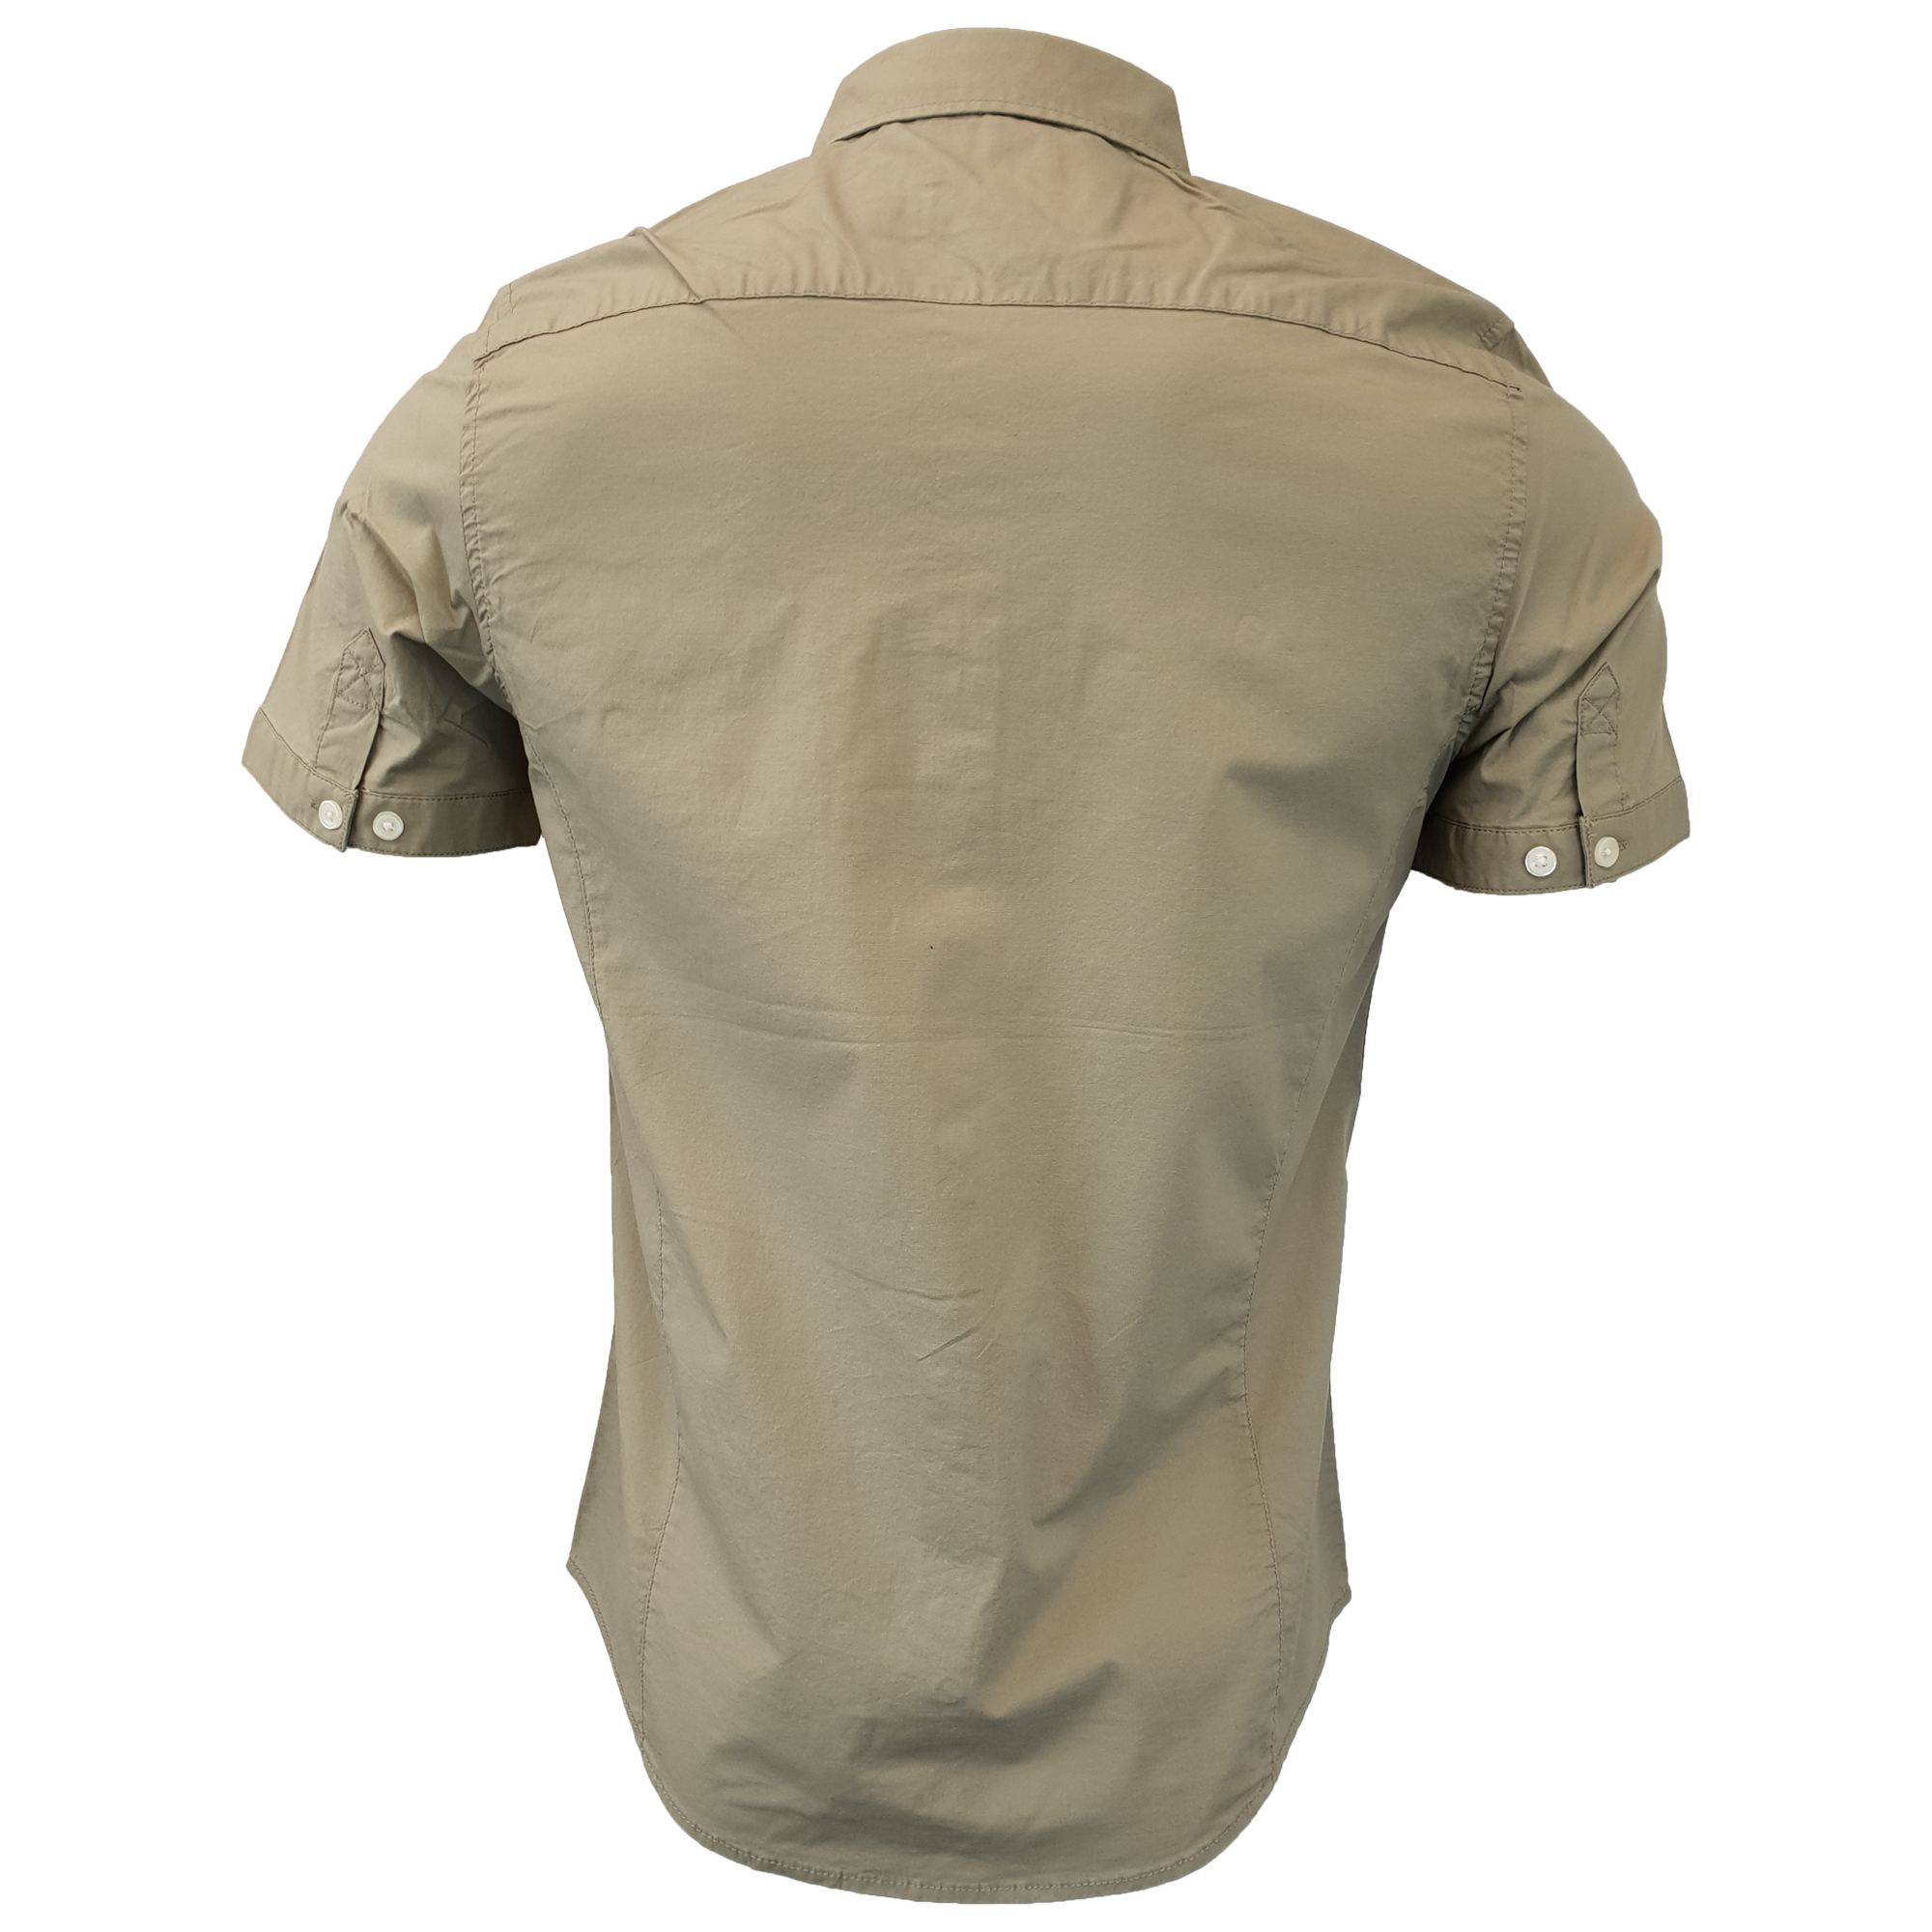 Mens-Linen-Cotton-Shirt-Tokyo-Laundry-Wells-Short-Sleeved-Grosvenor-Summer-New thumbnail 12